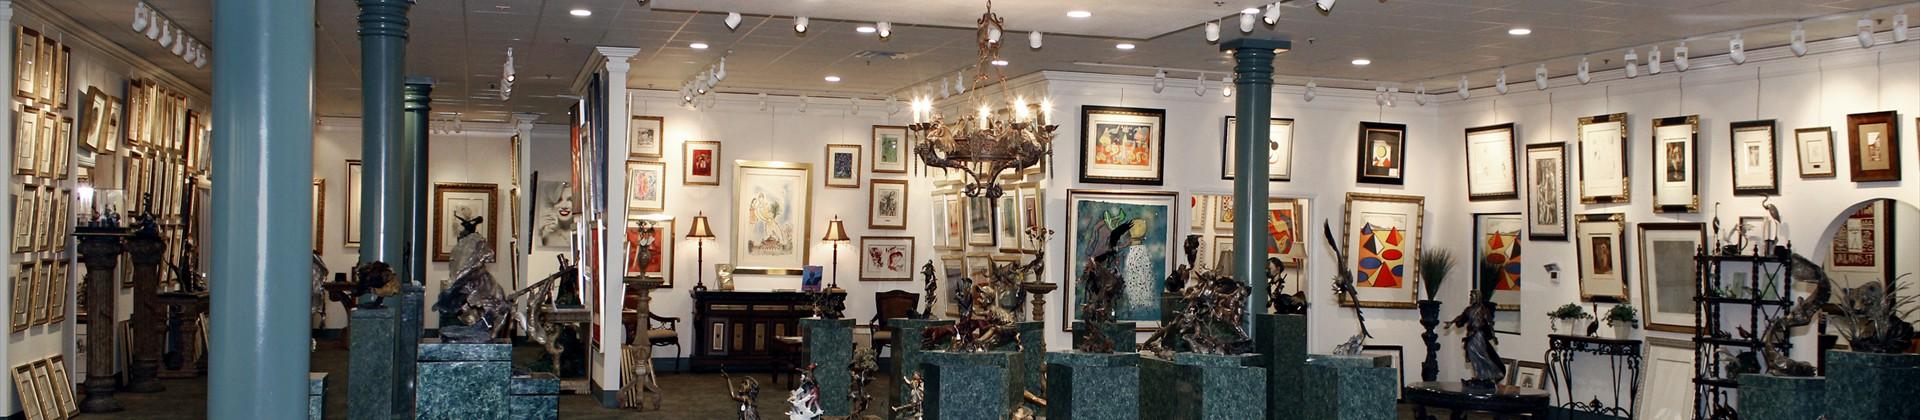 Centaur Art Gallery Las Vegas Nevada